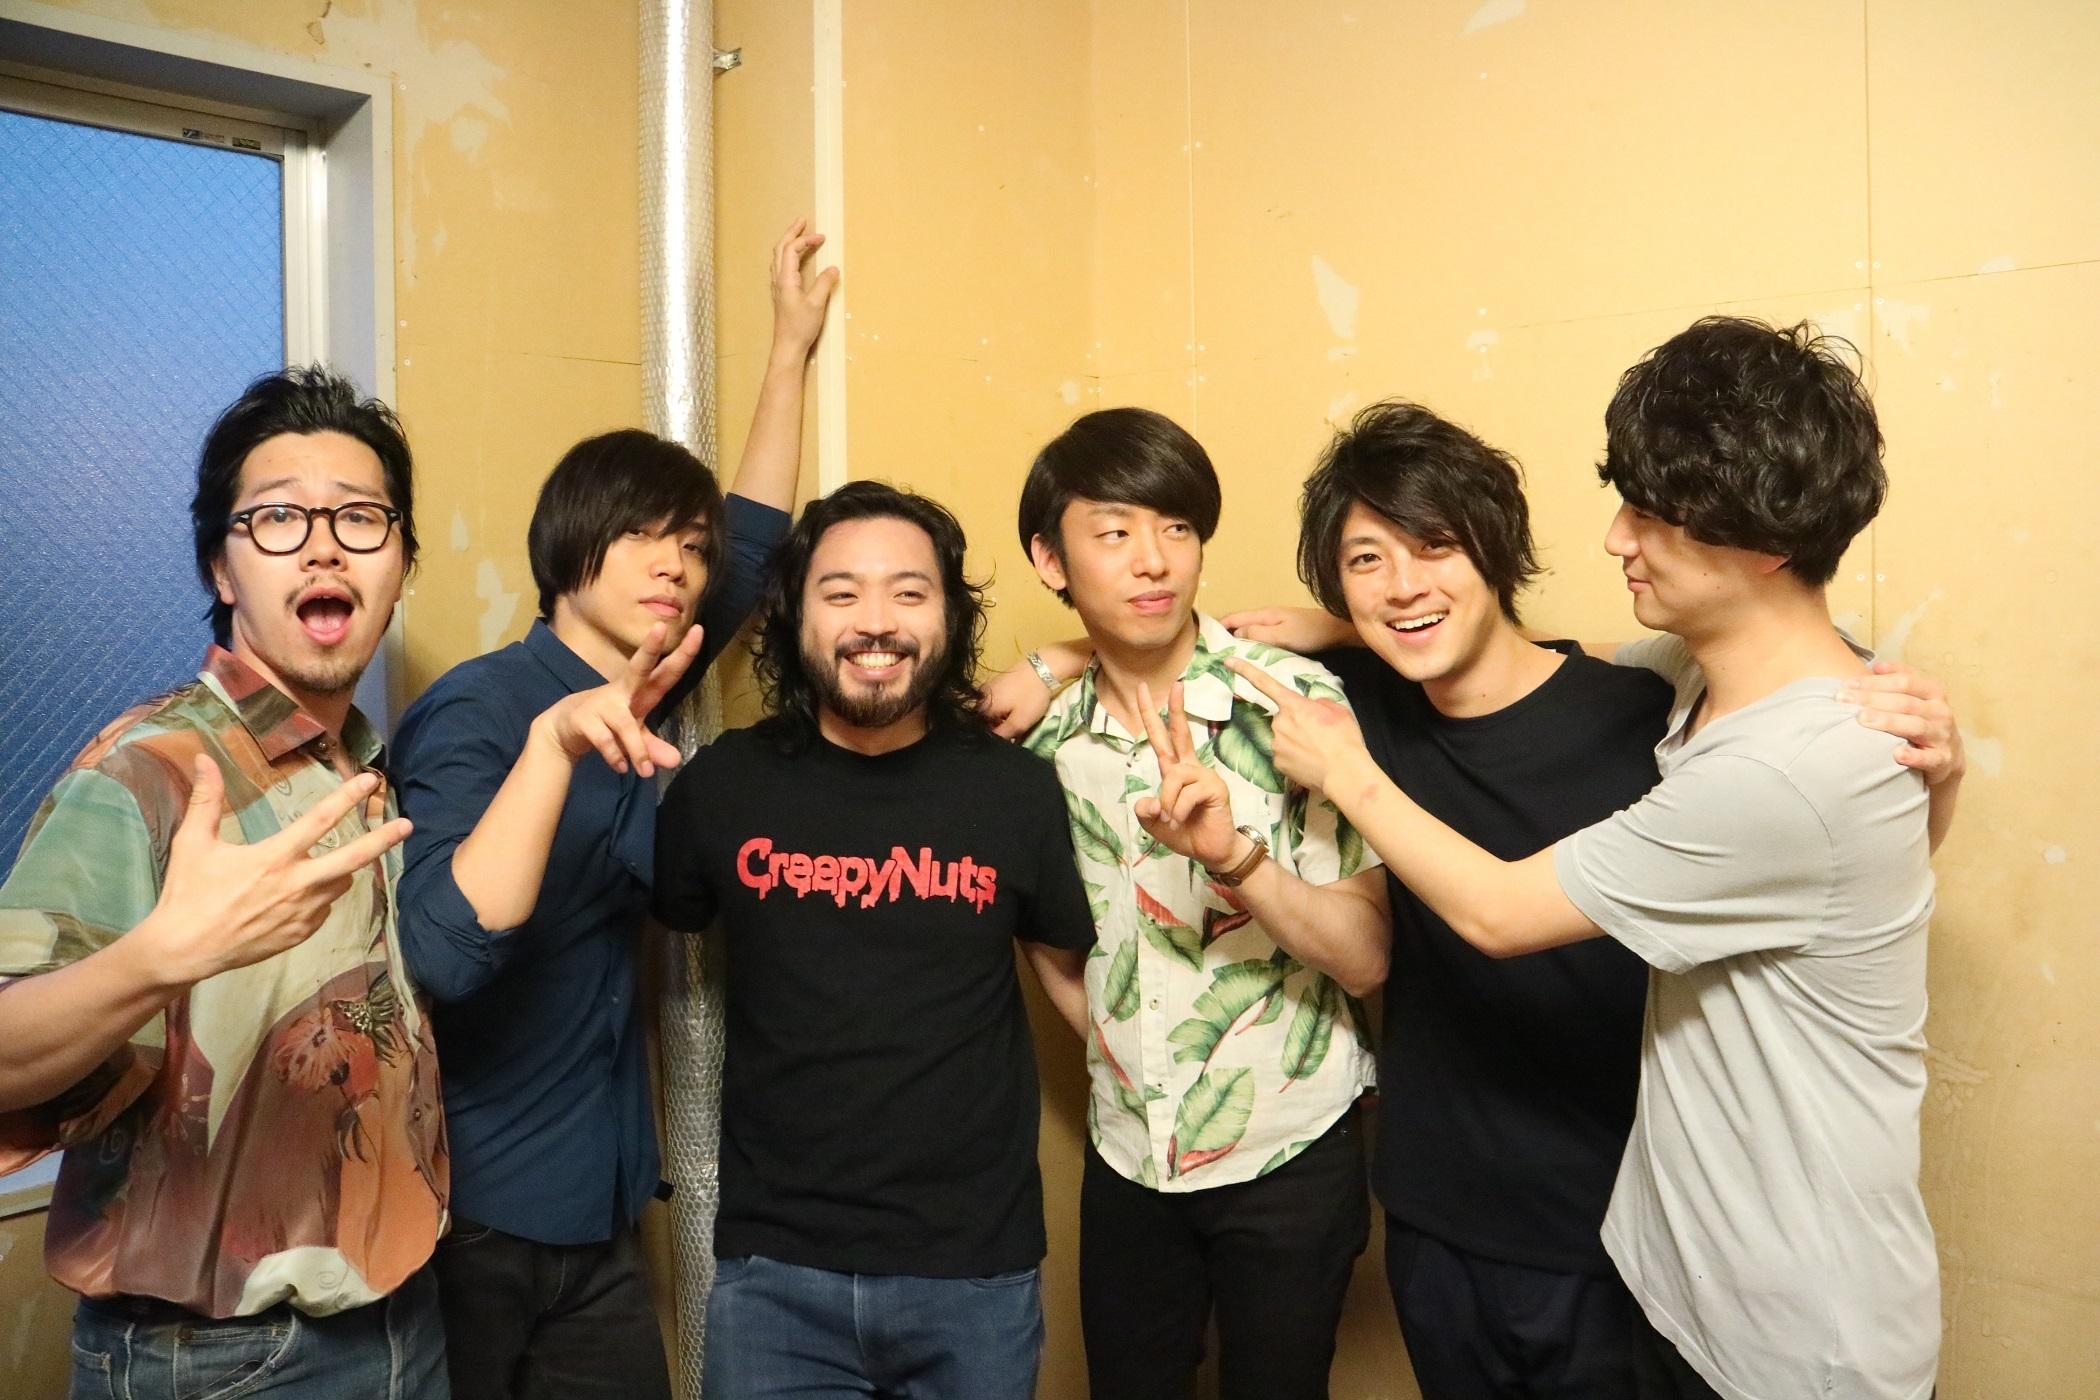 androp、Creepy Nuts  撮影=Taichi Nishimaki、Rui Hashimoto(SOUND SHOOTER)